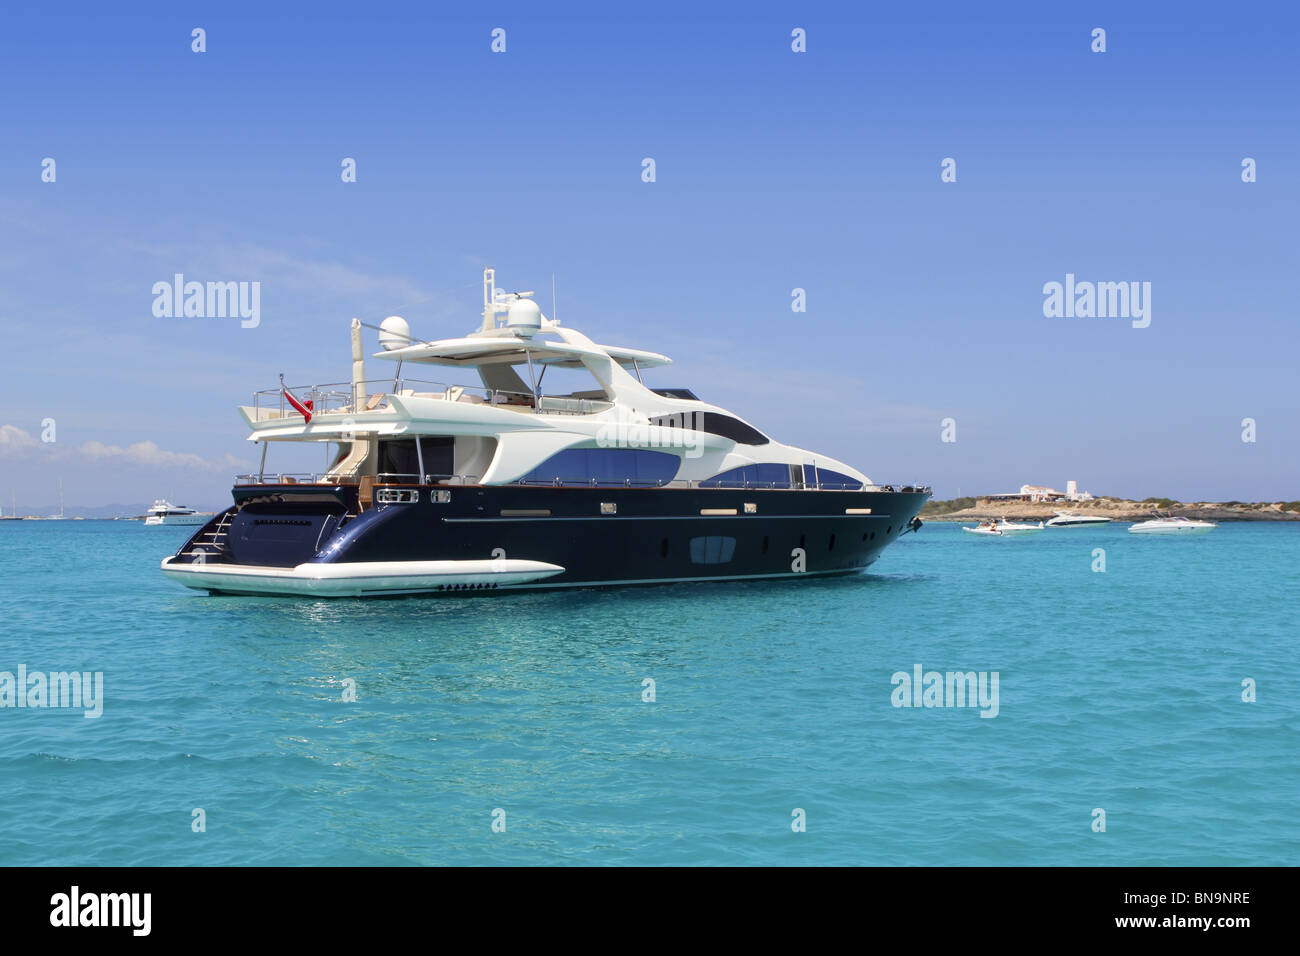 luxury yacht in turquoise Illetes Formentera mediterranean sea Balearic Islands - Stock Image